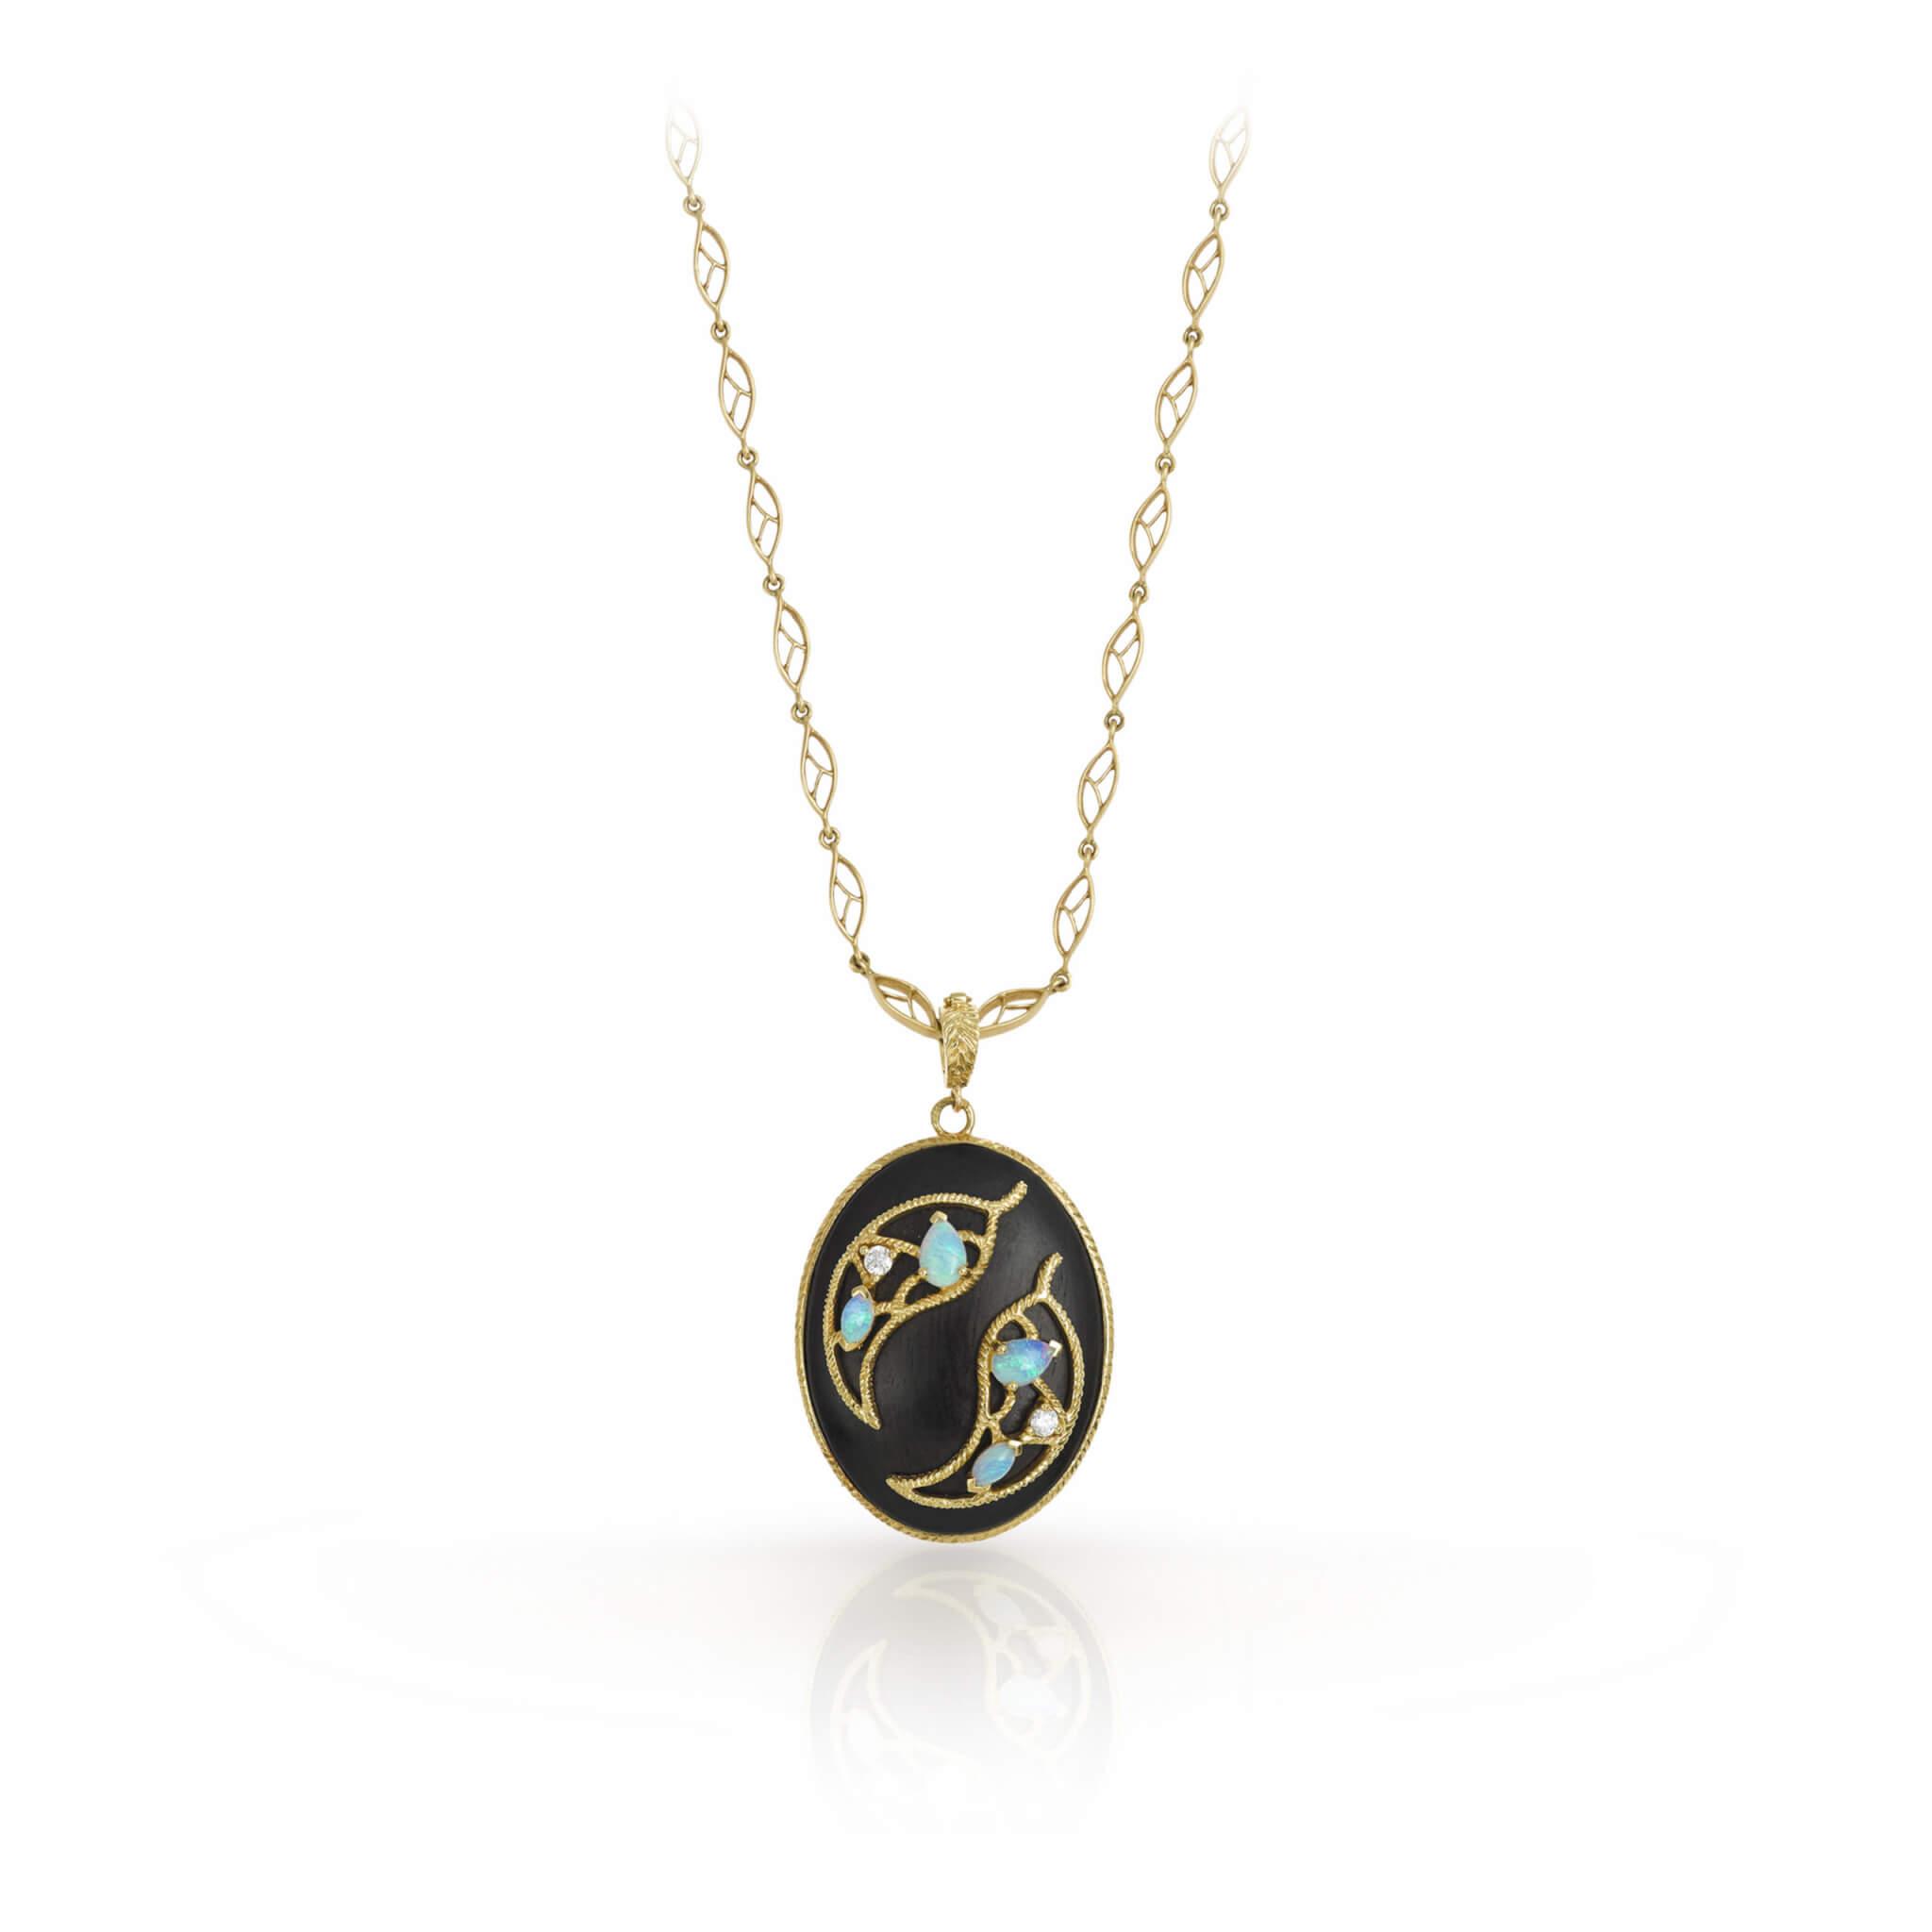 Ebene collier or jaune opale